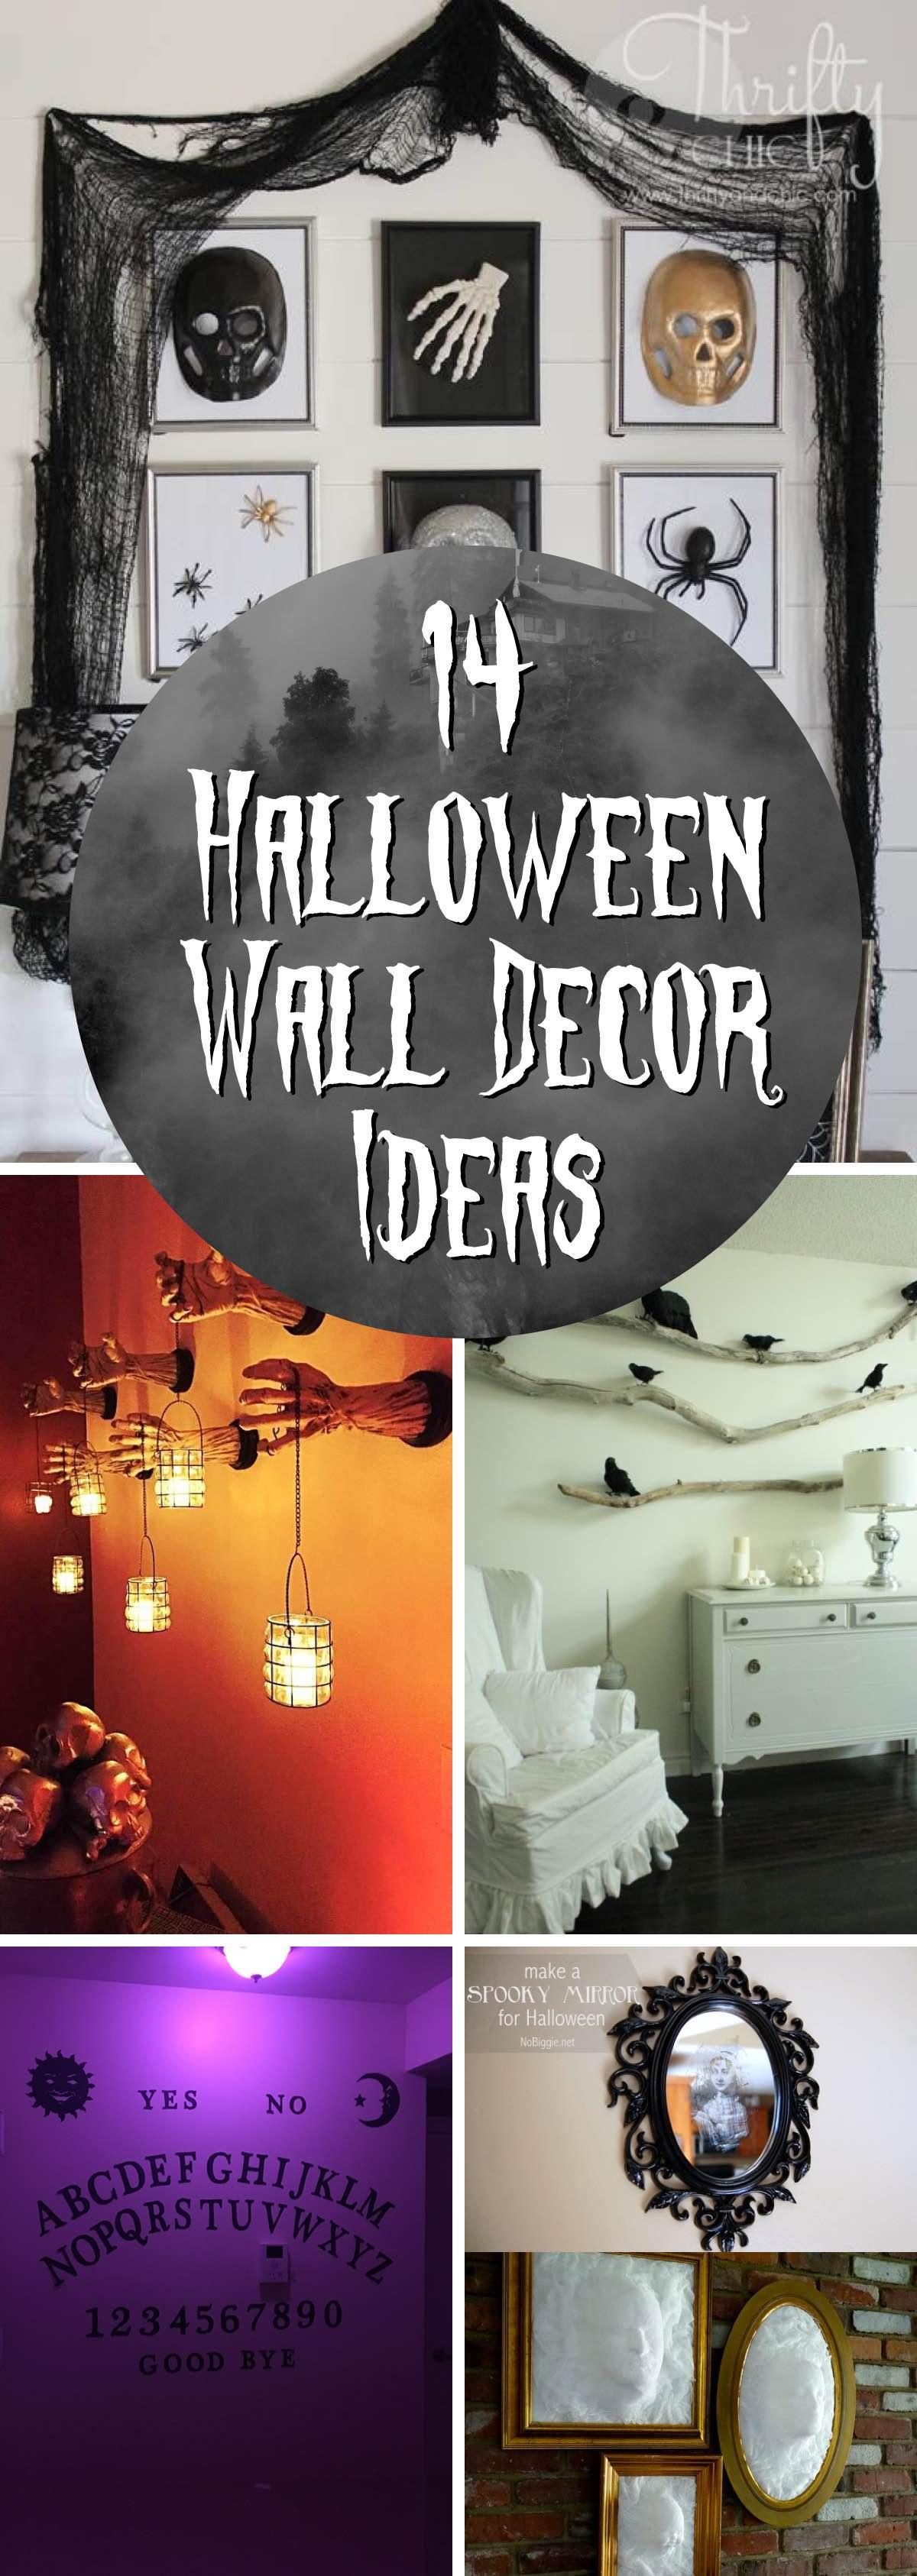 Halloween Wall Decor Ideas